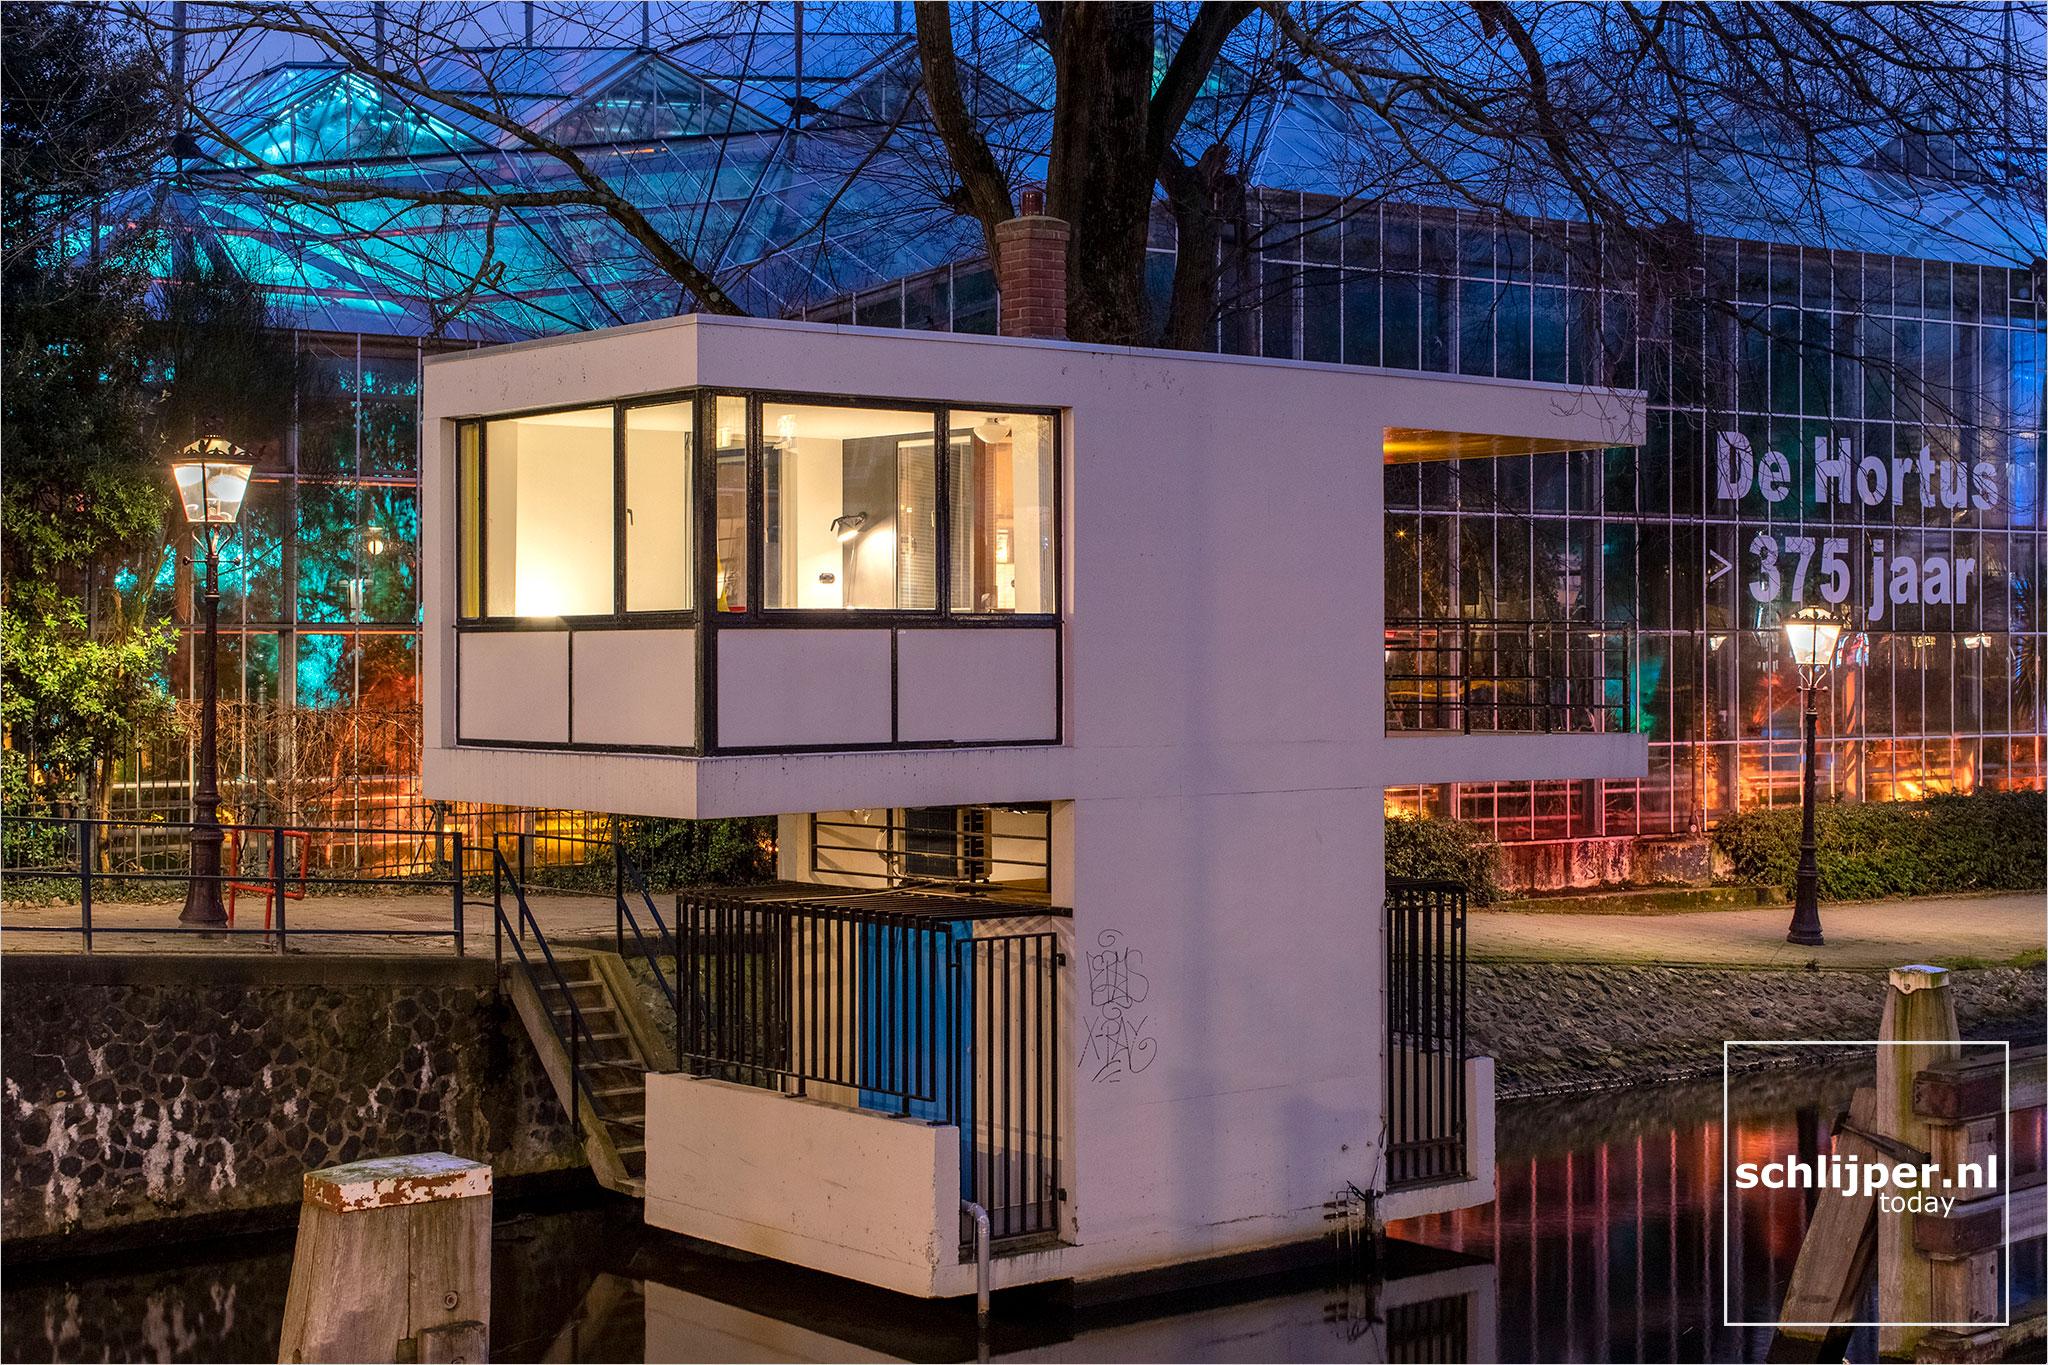 The Netherlands, Amsterdam, 6 januari 2021